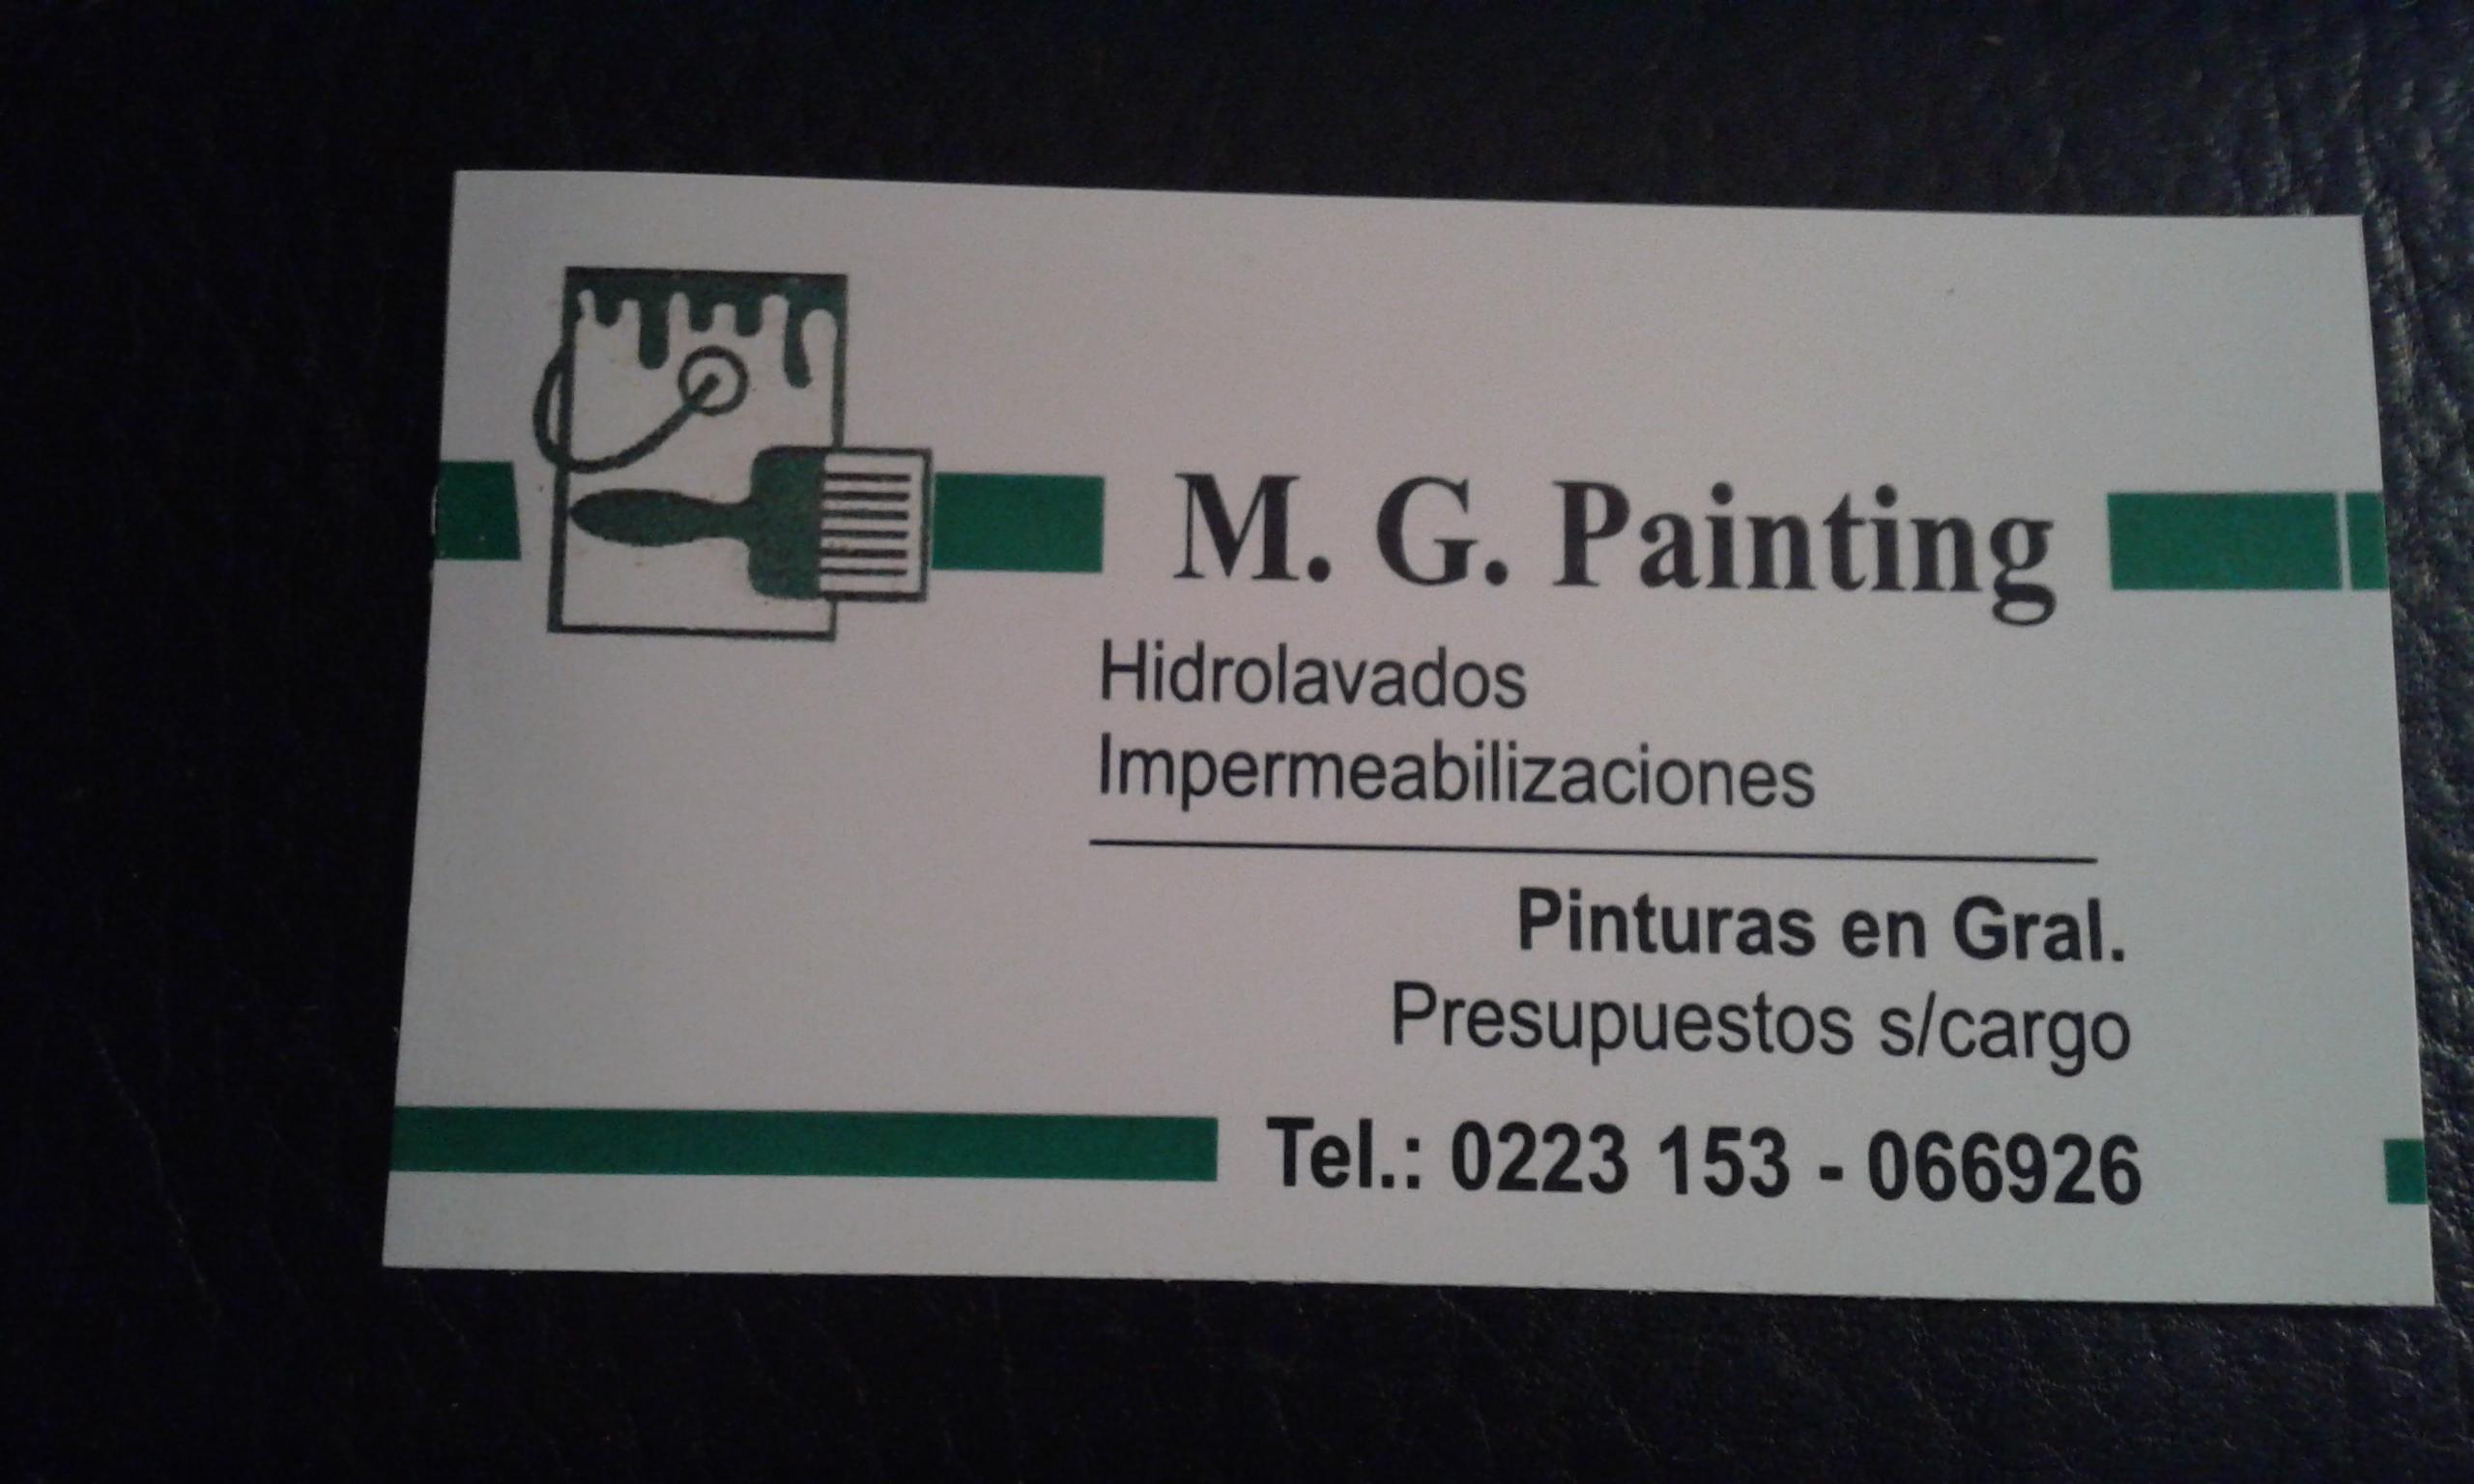 M.G. PAINTING